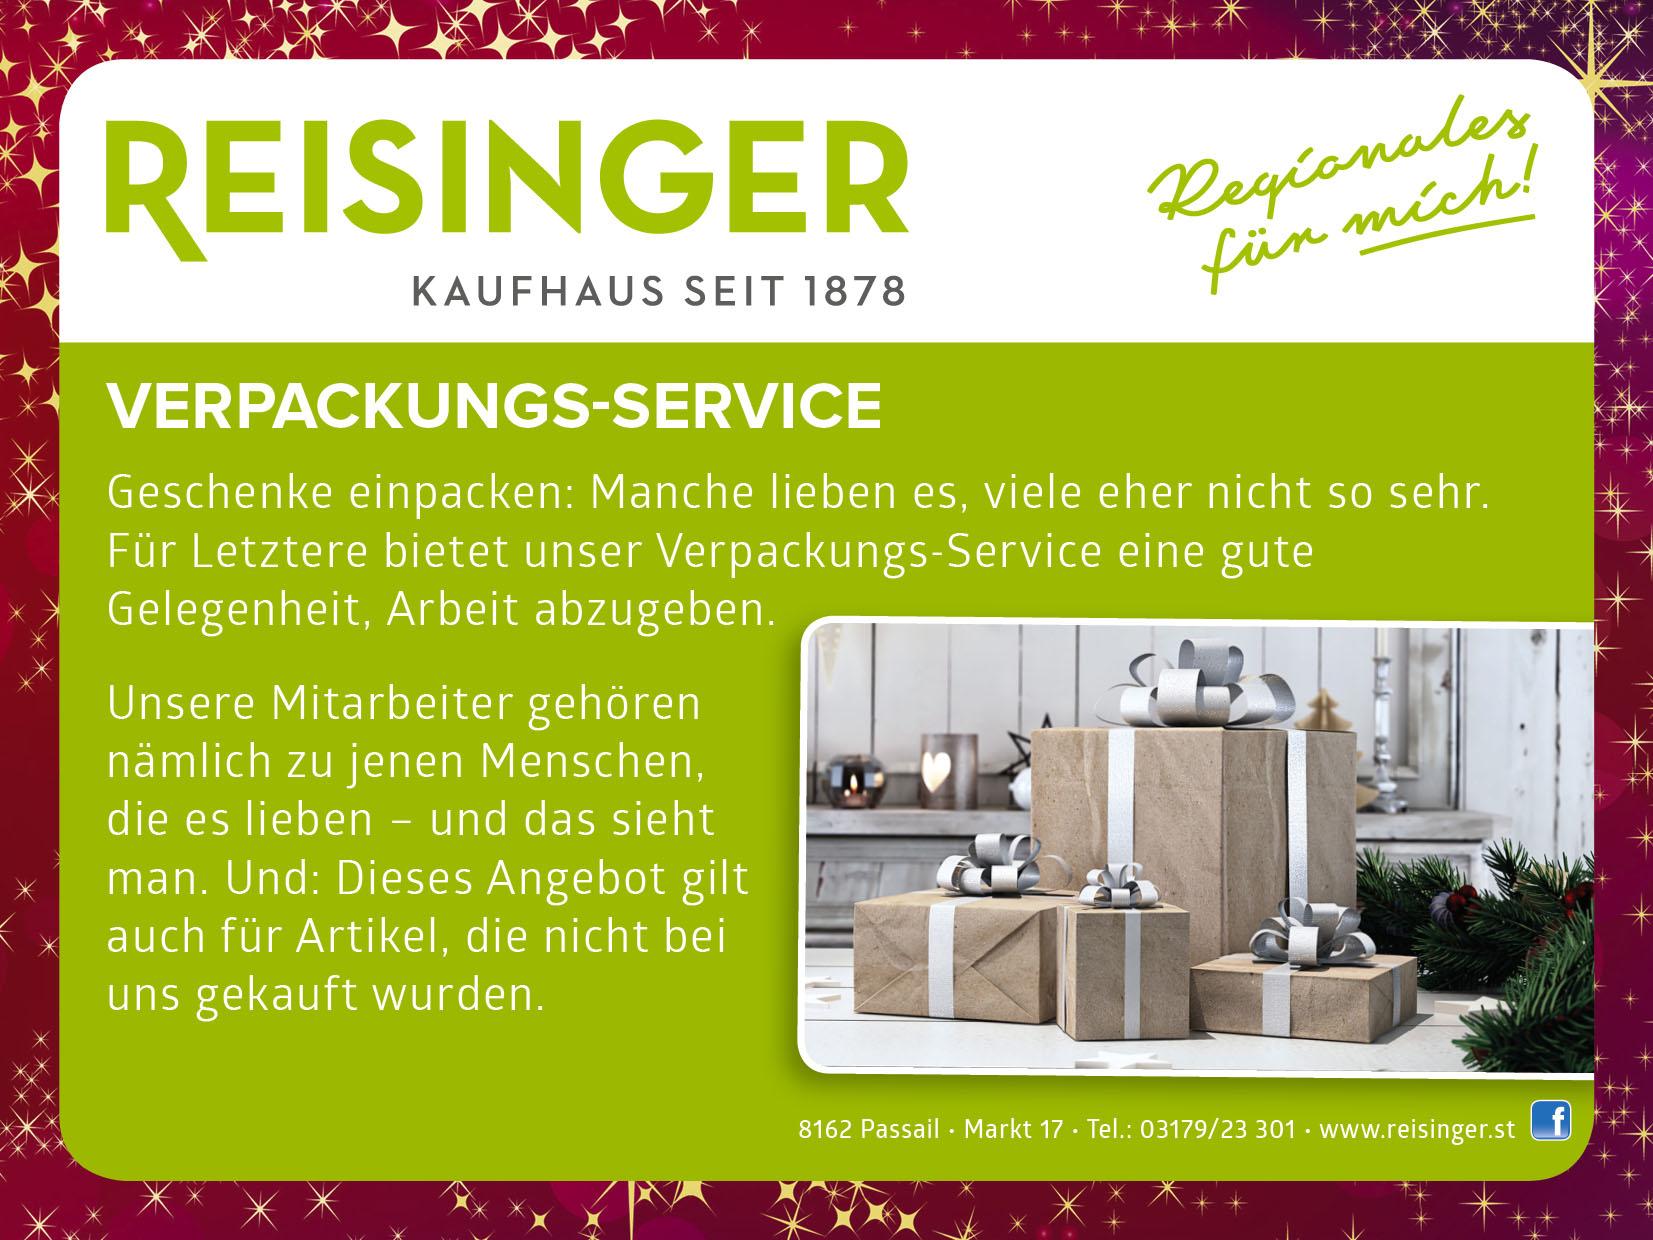 Verpackungsservice